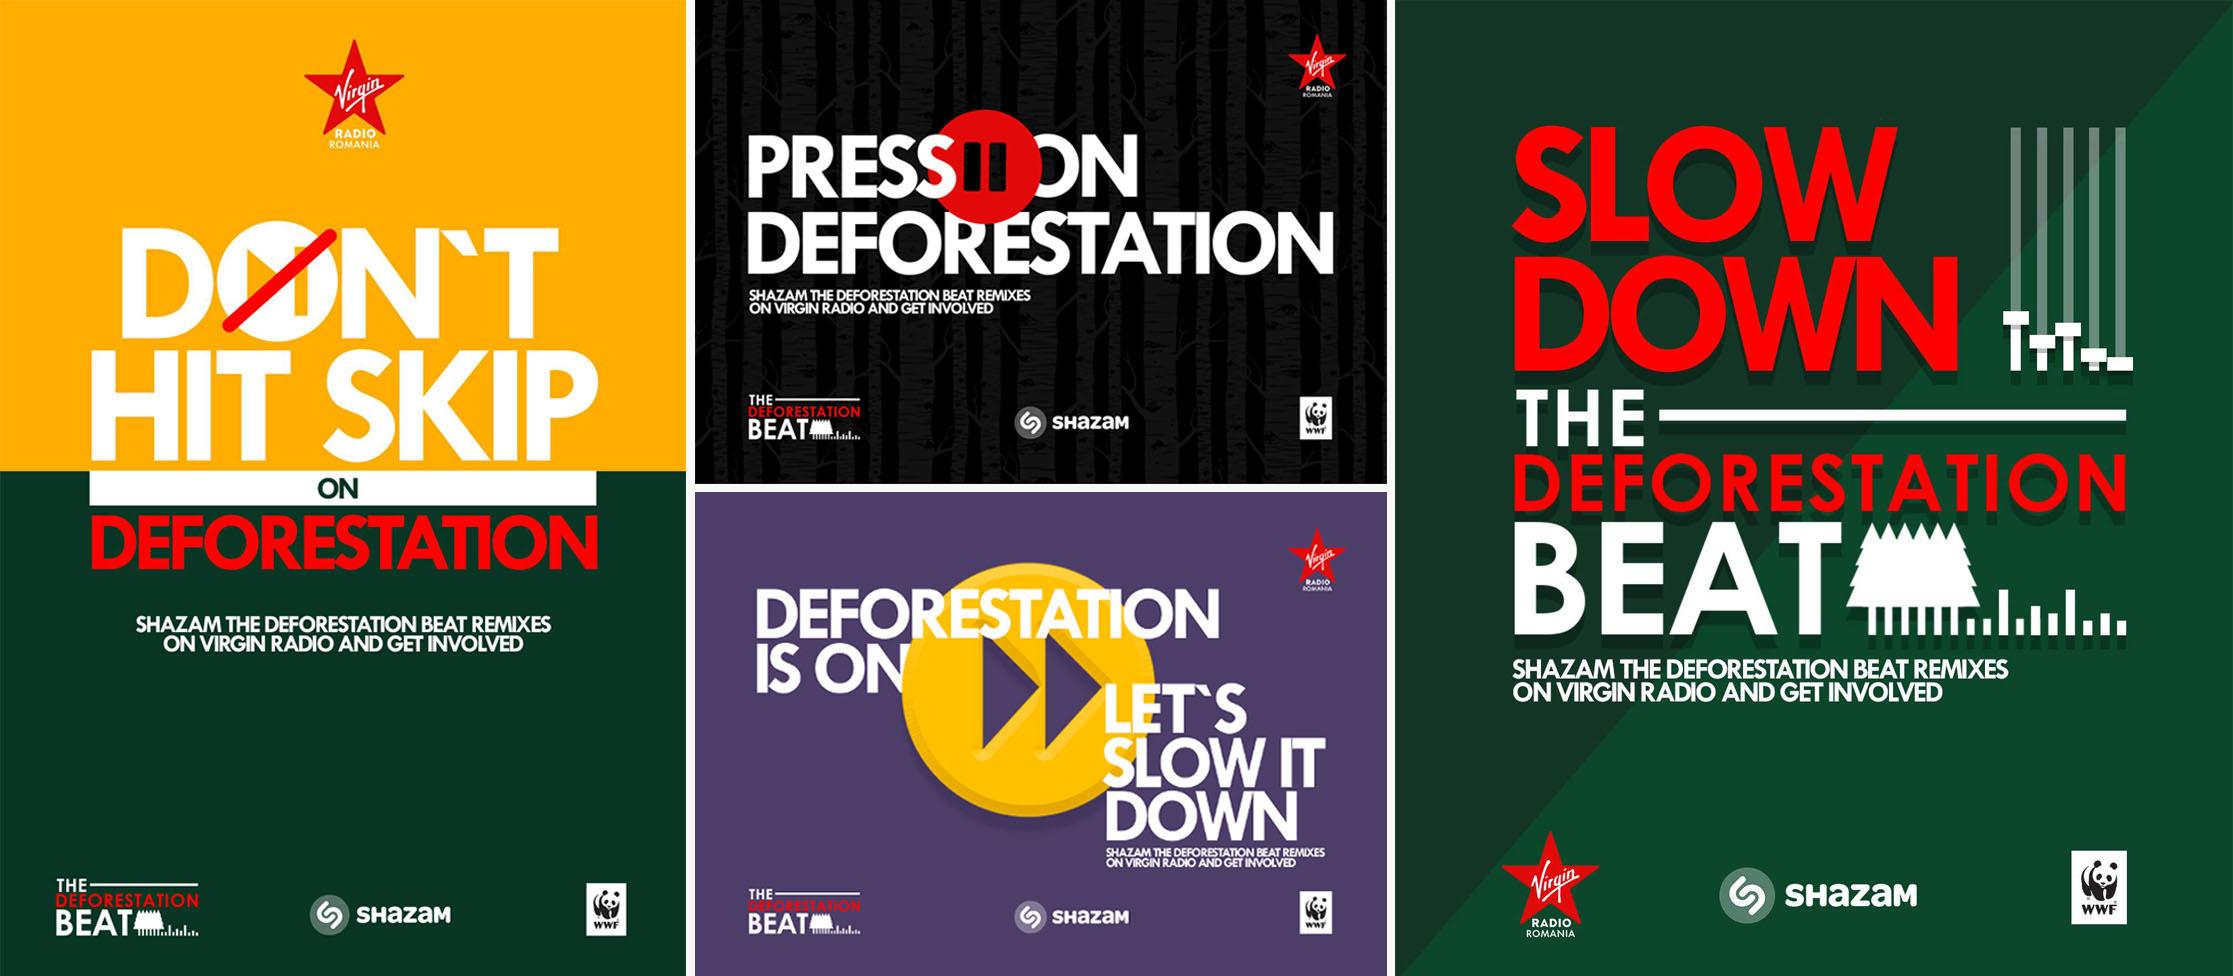 Deforestation Content Arranged